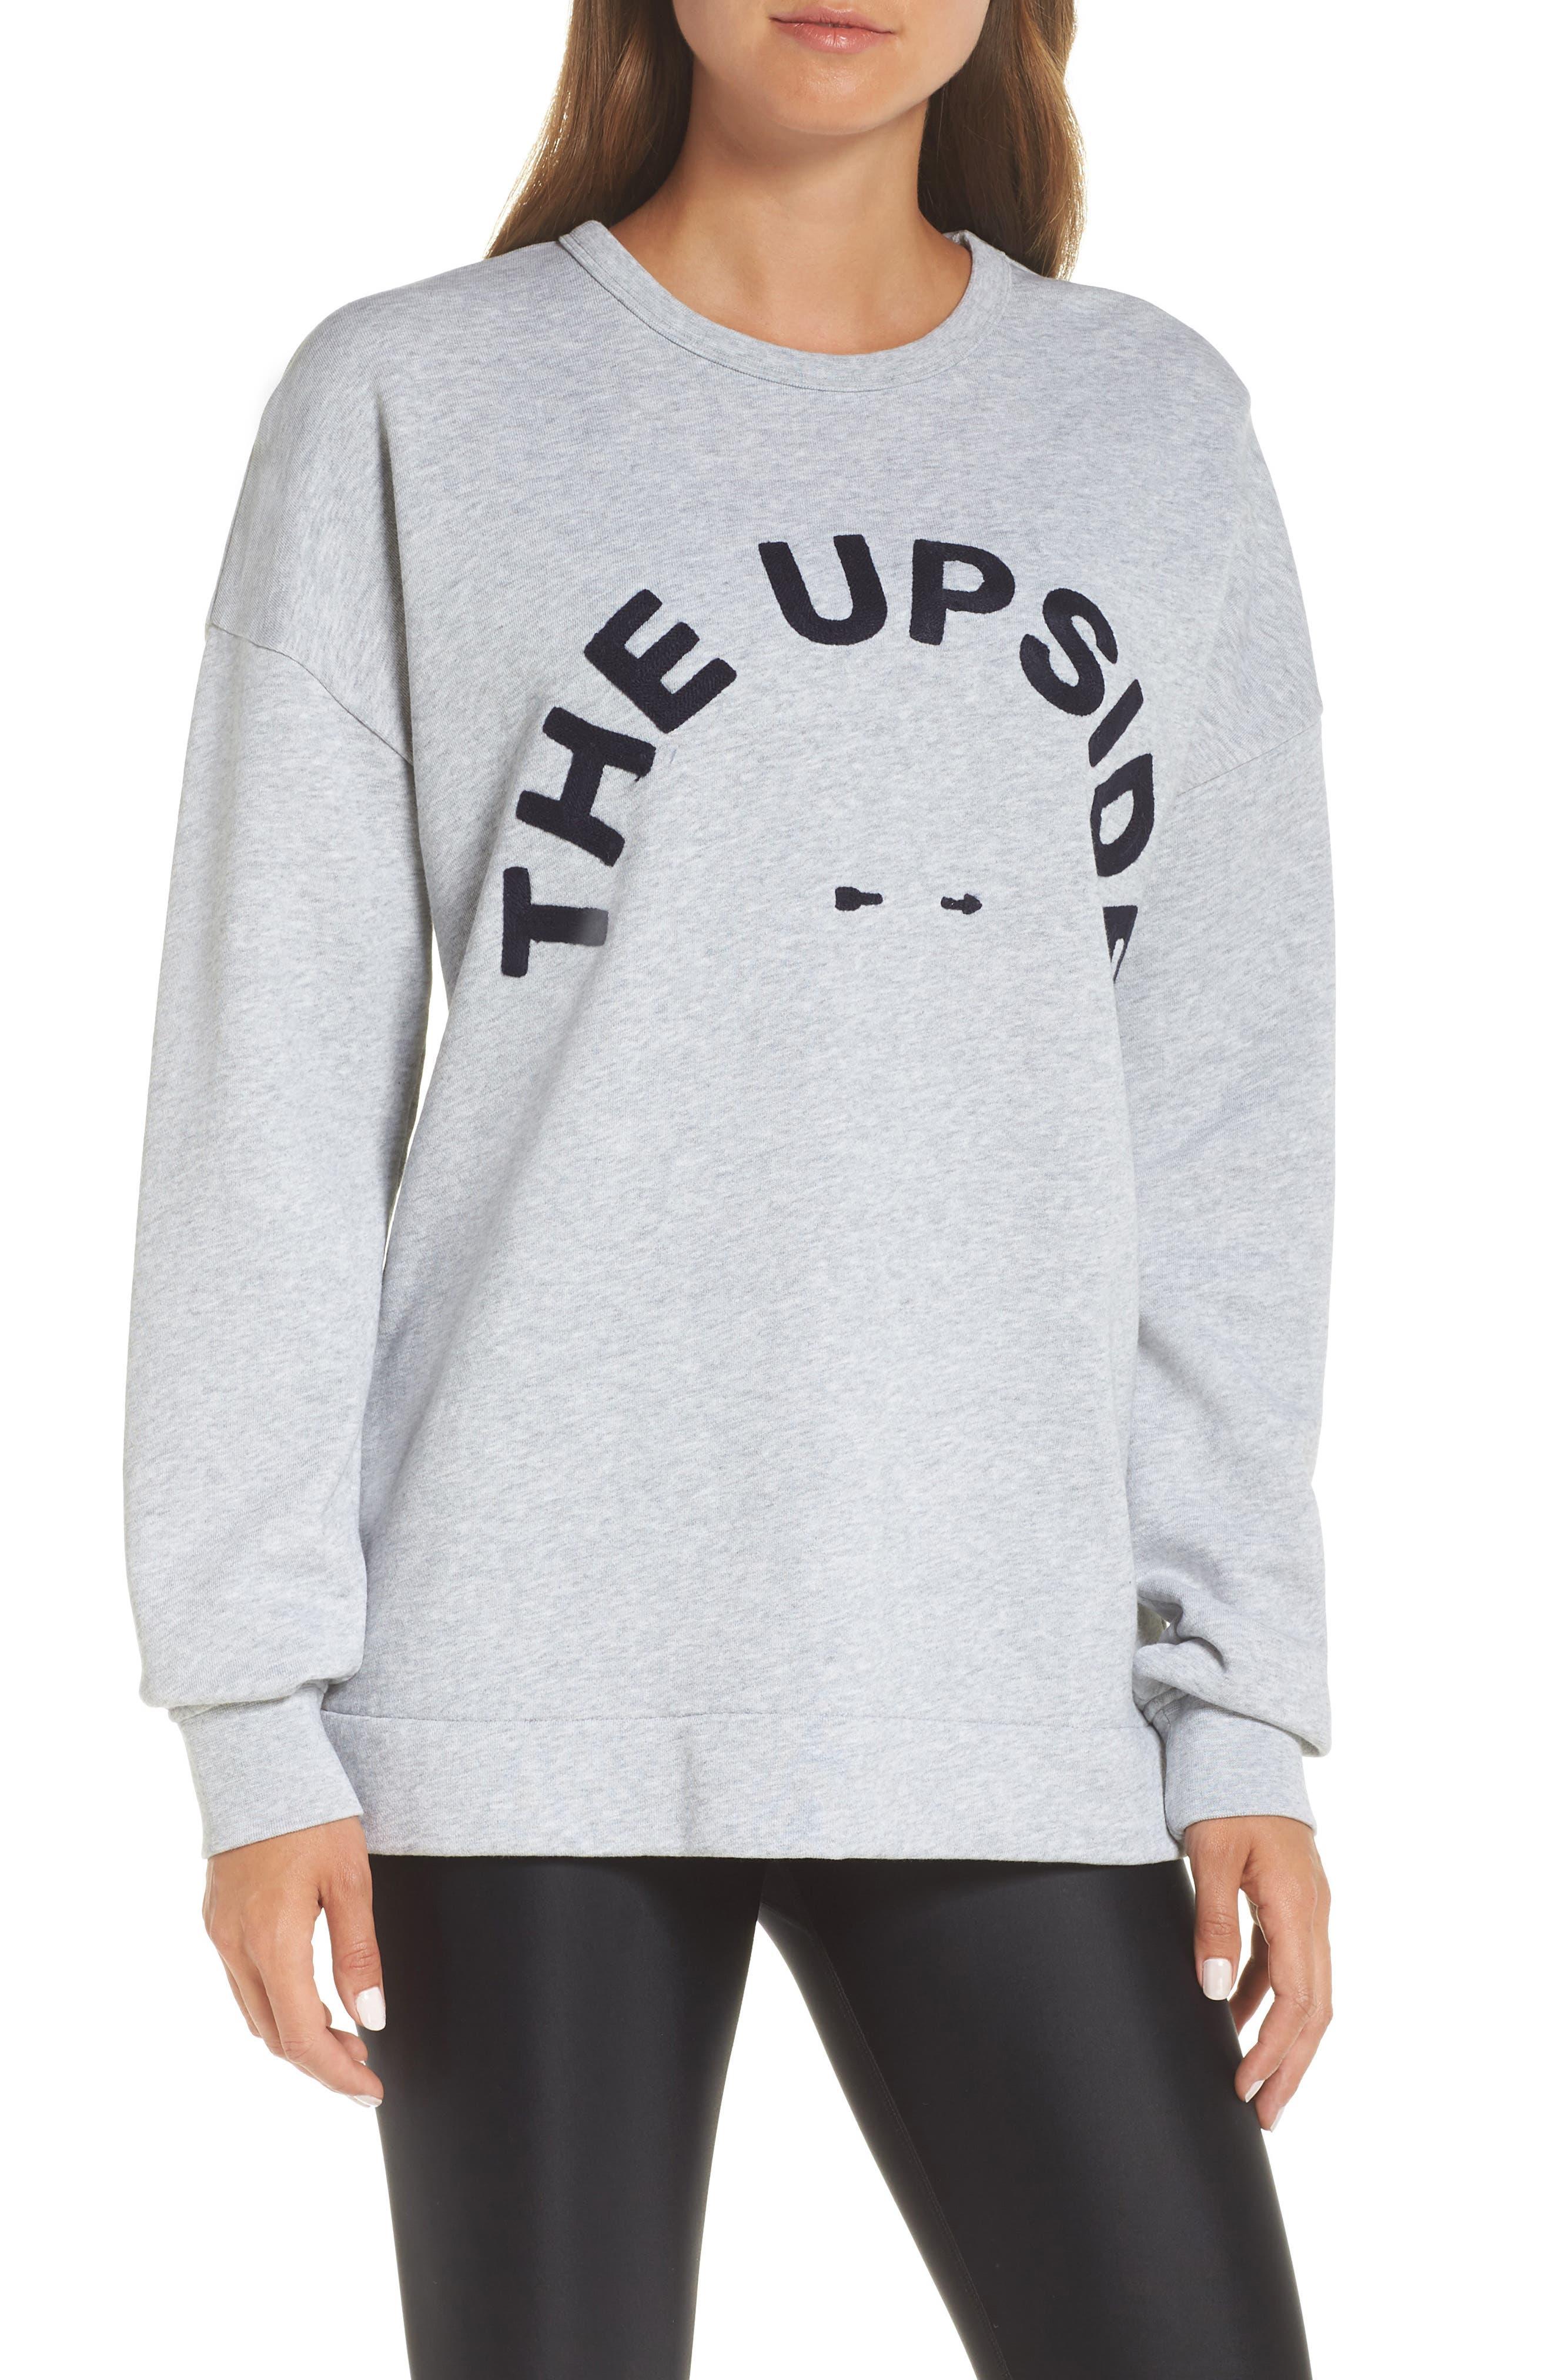 Club55 Cutout Back Sweatshirt,                         Main,                         color, GREY MARLE